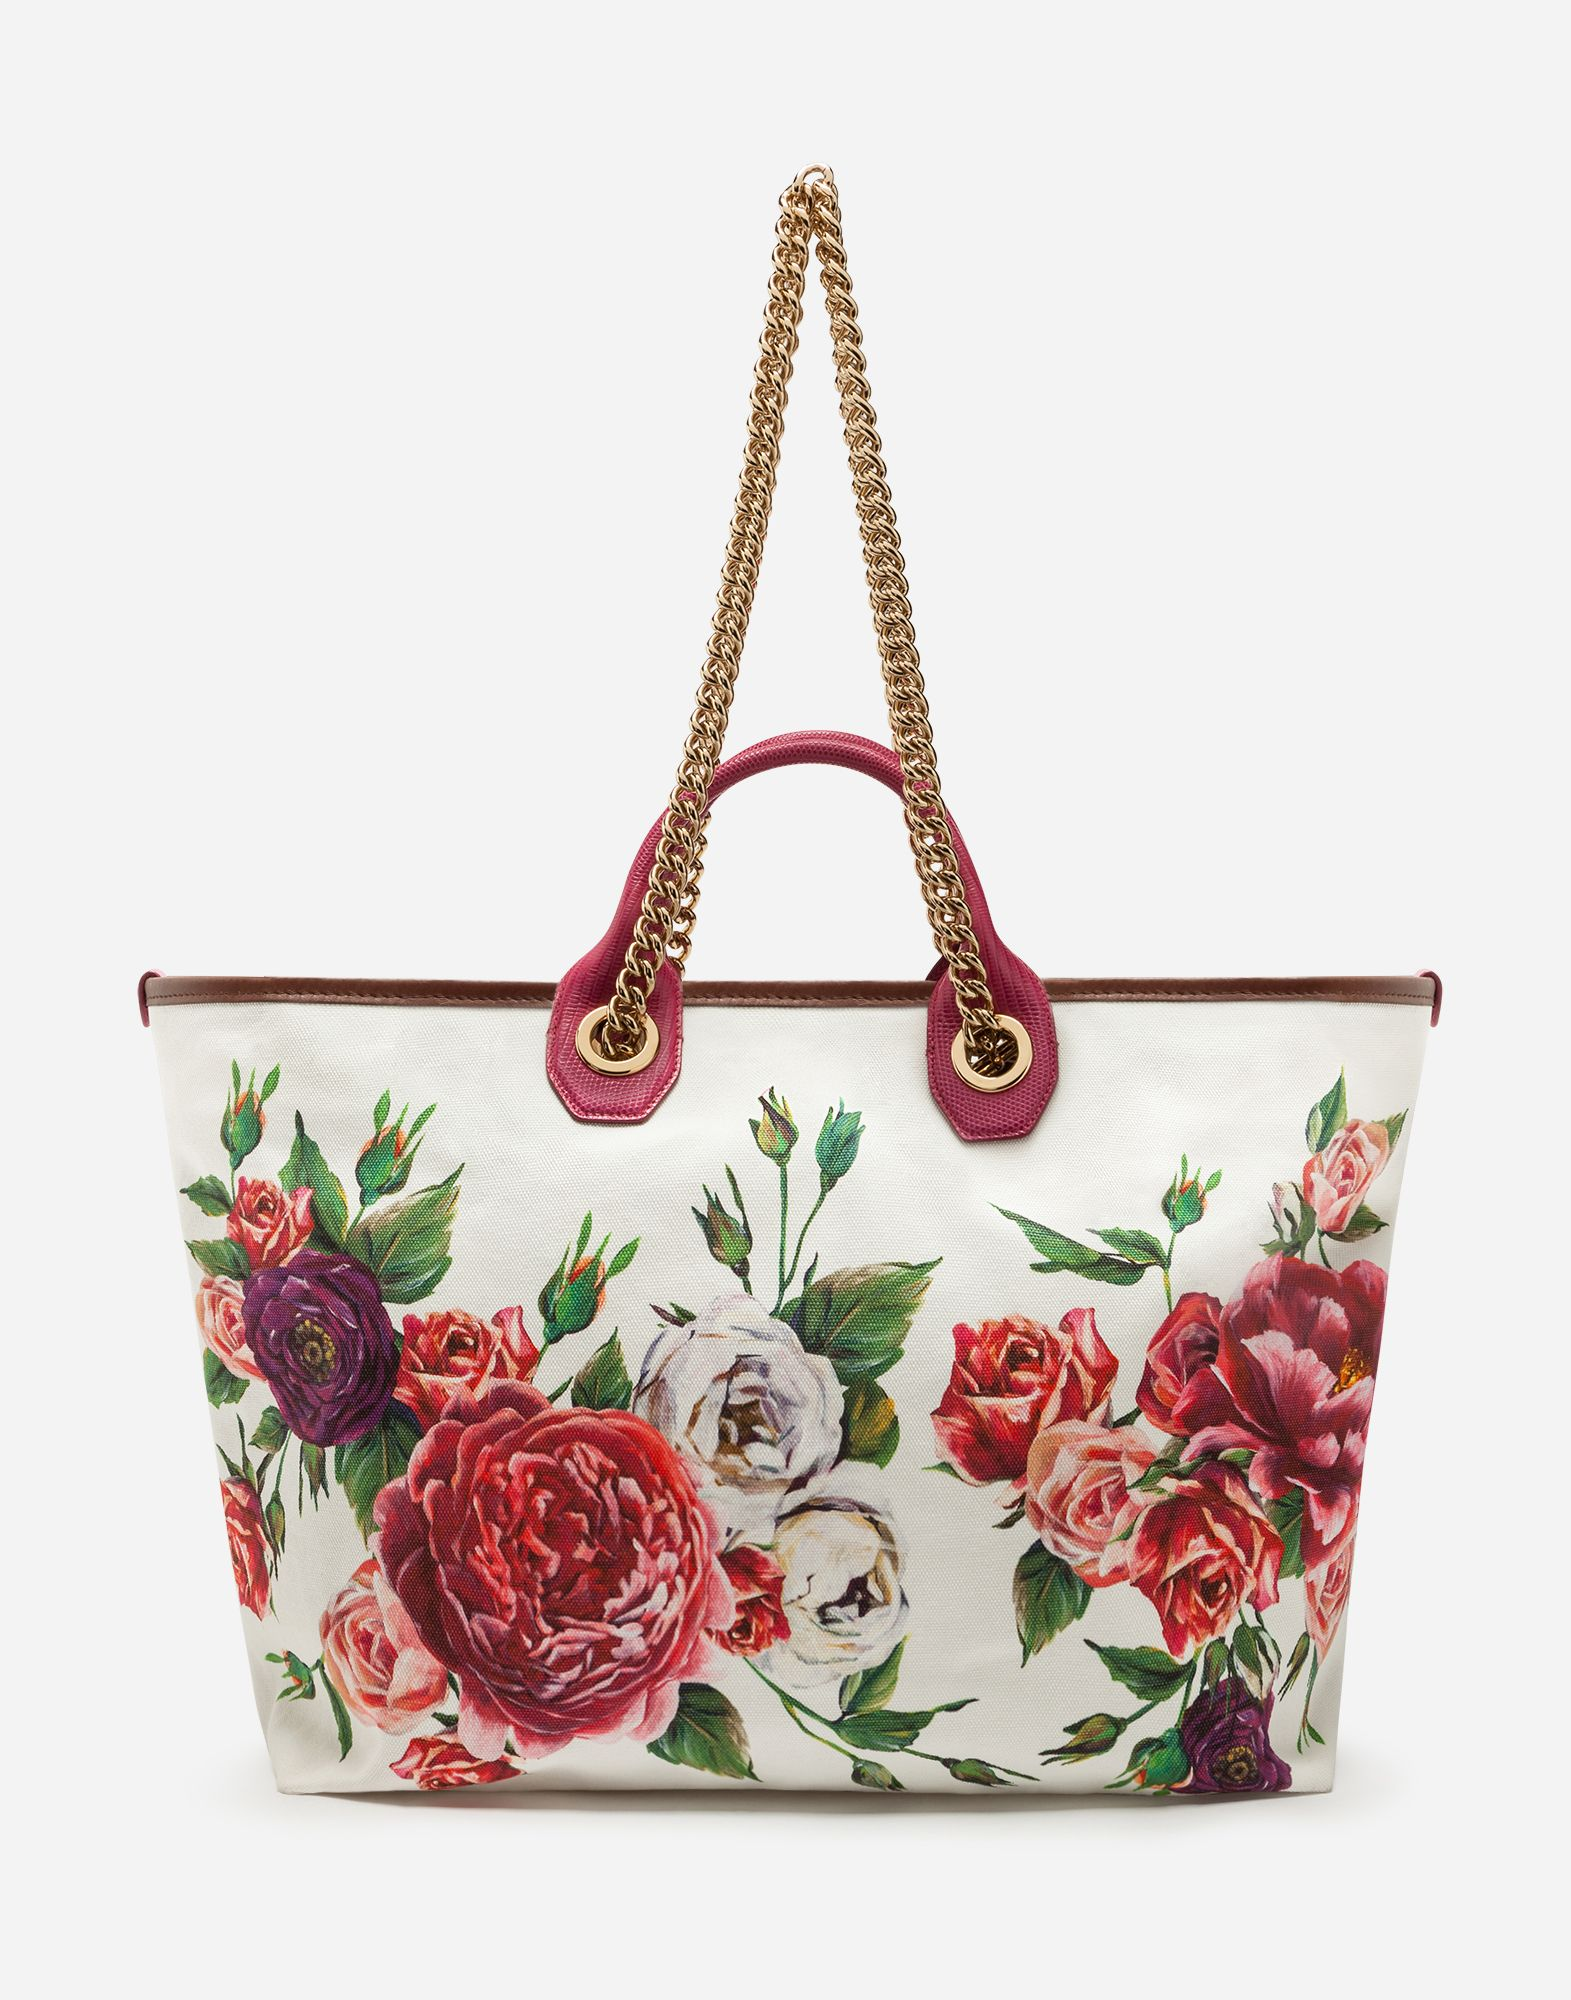 c7b1ebf61b42 2018 年の「Medium capri shopping bag in printed canvas」